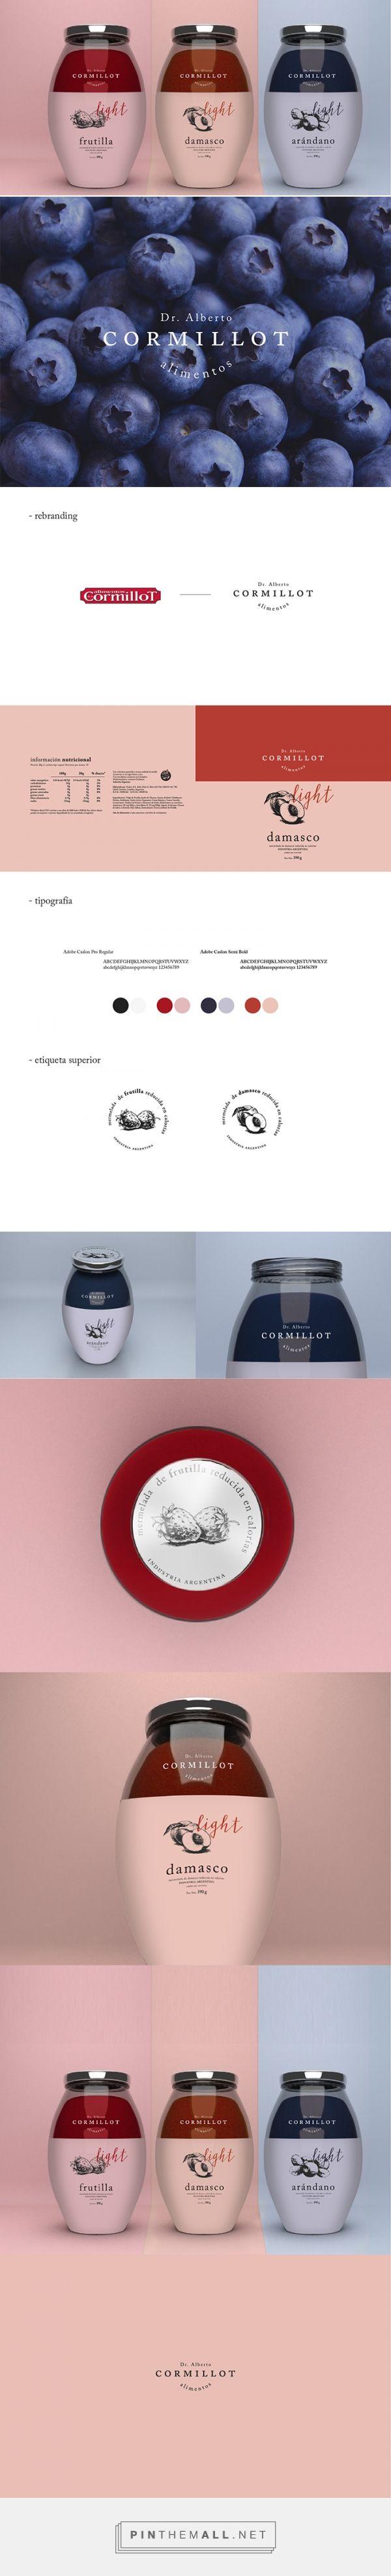 Rebranding Dr. Alberto Cormillot jam by Carmen Alicia González Figueroa. Source: Daily Package Design Inspiration. #SFields99 #packaging #design #inspiration #rebrand #jar #label #jam #preserves